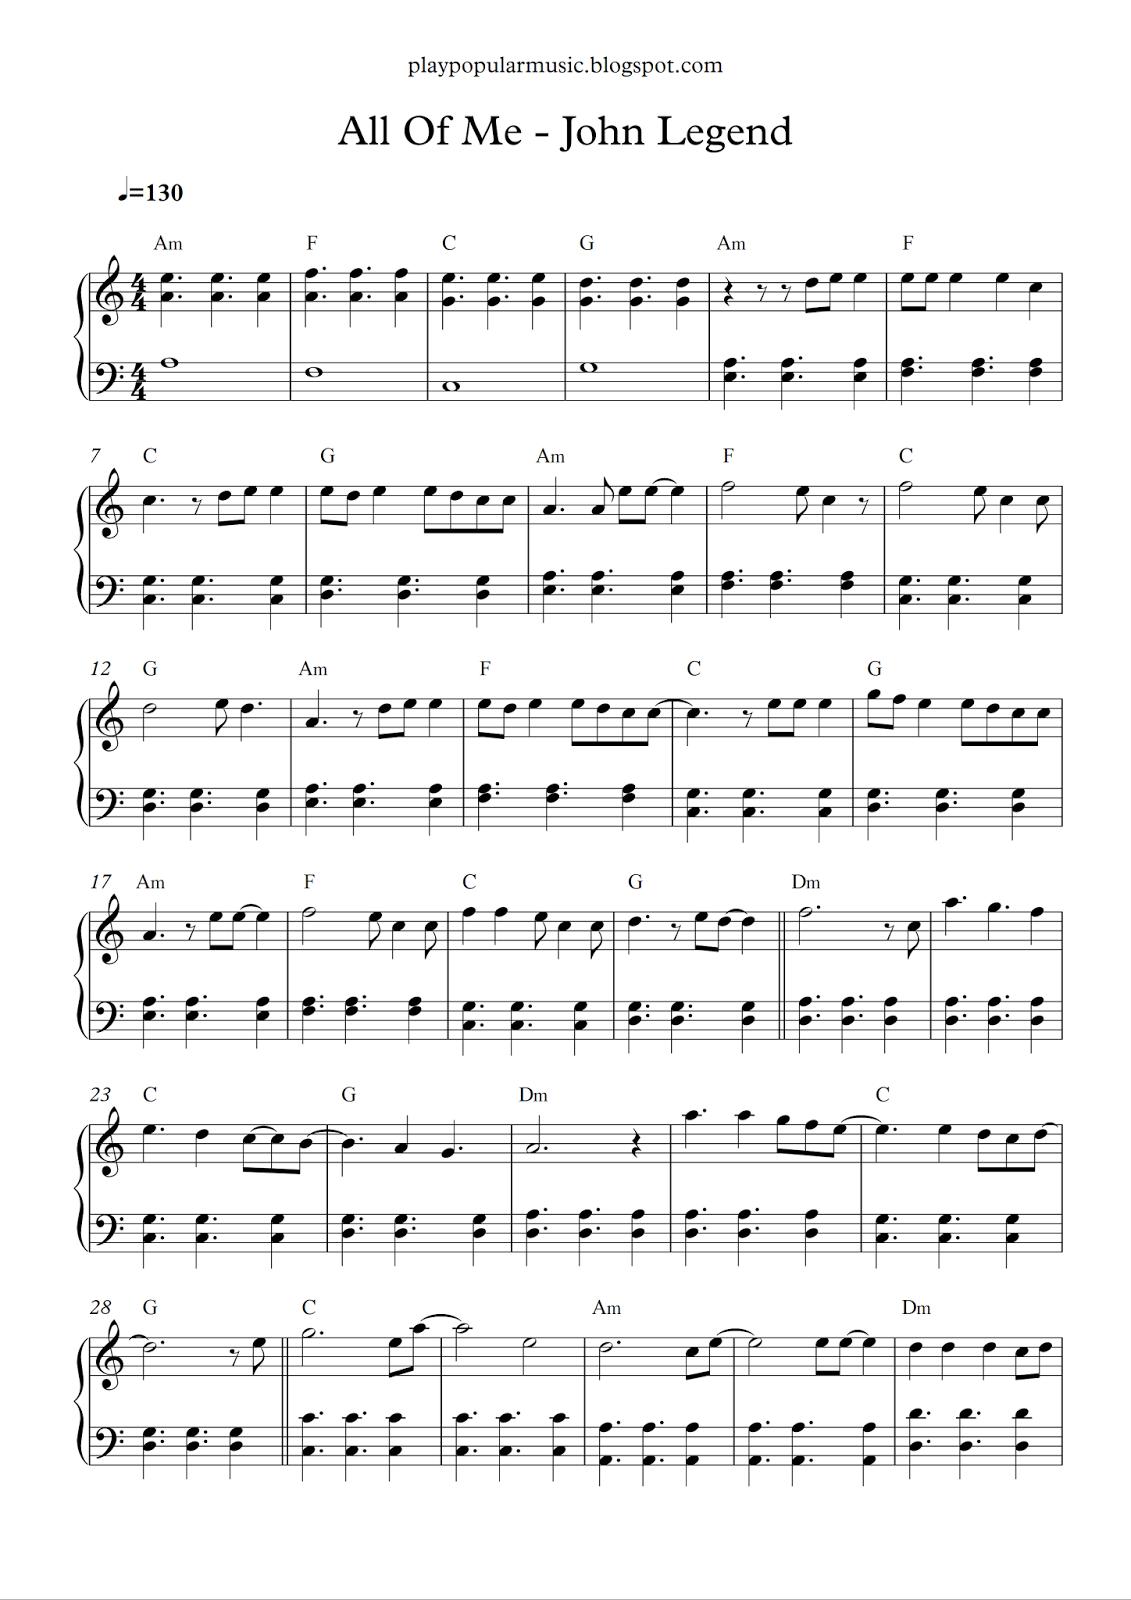 play popular music: All Of Me - John Legend